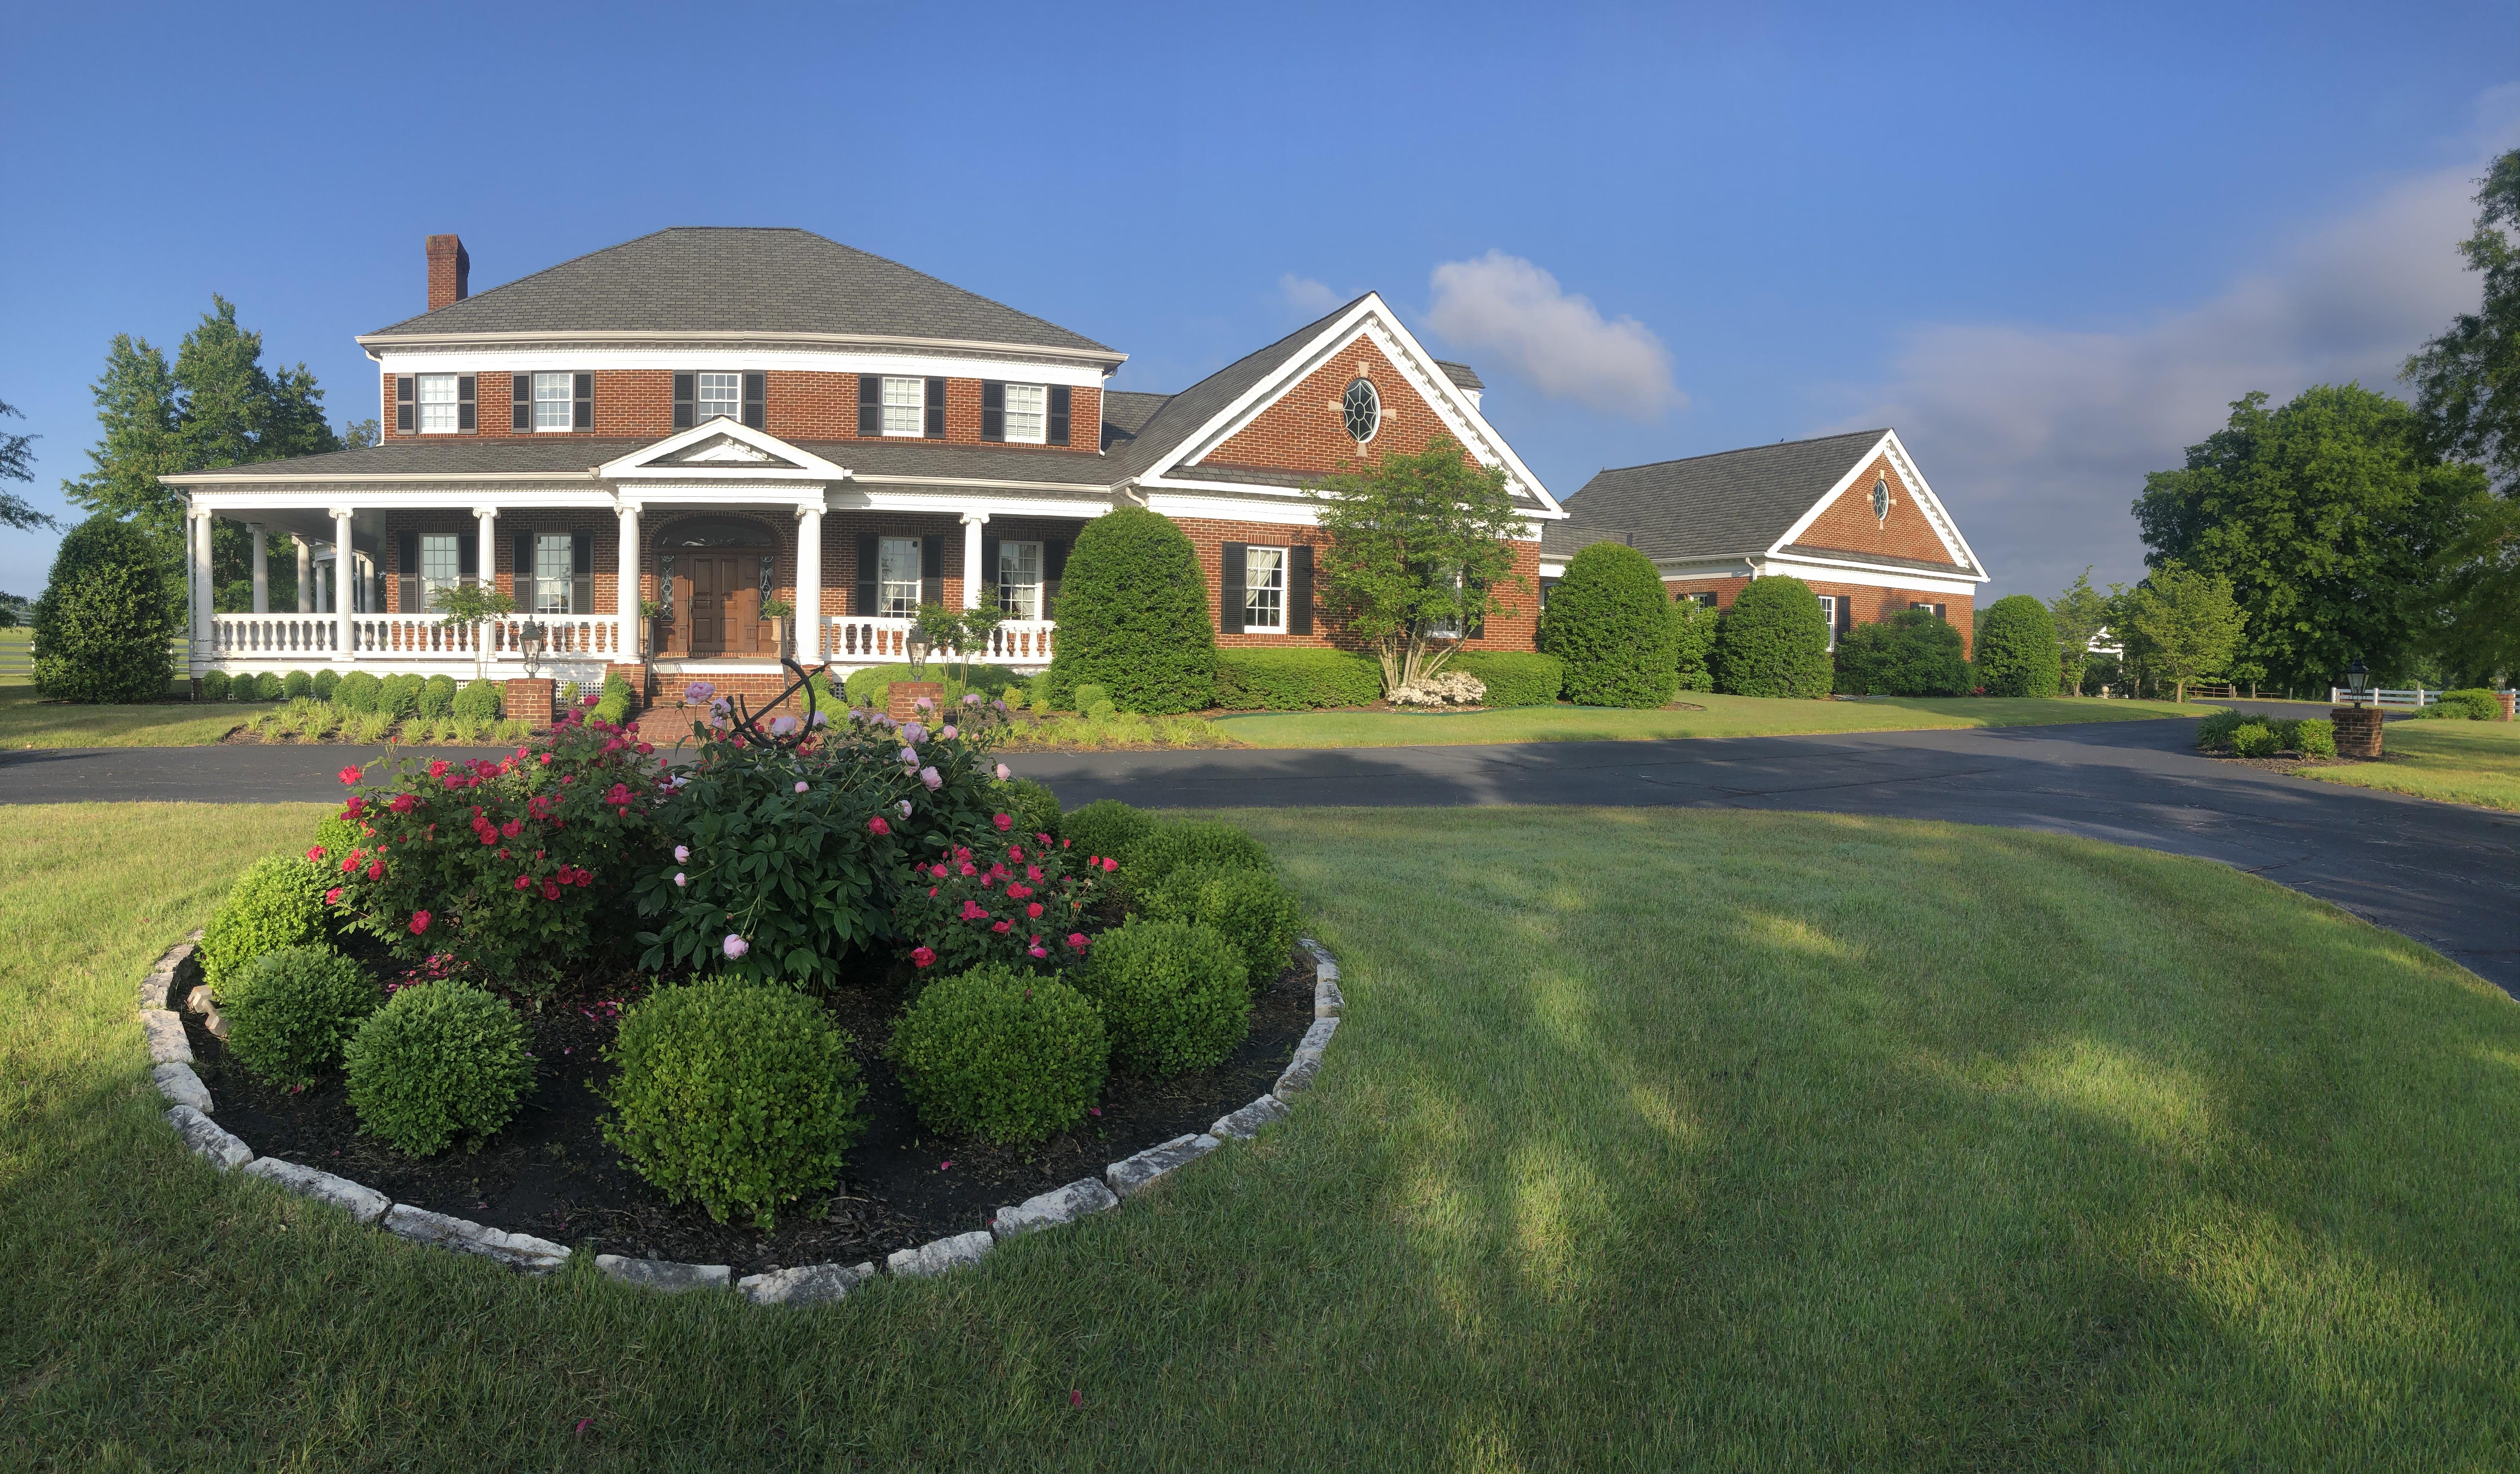 Driveway House